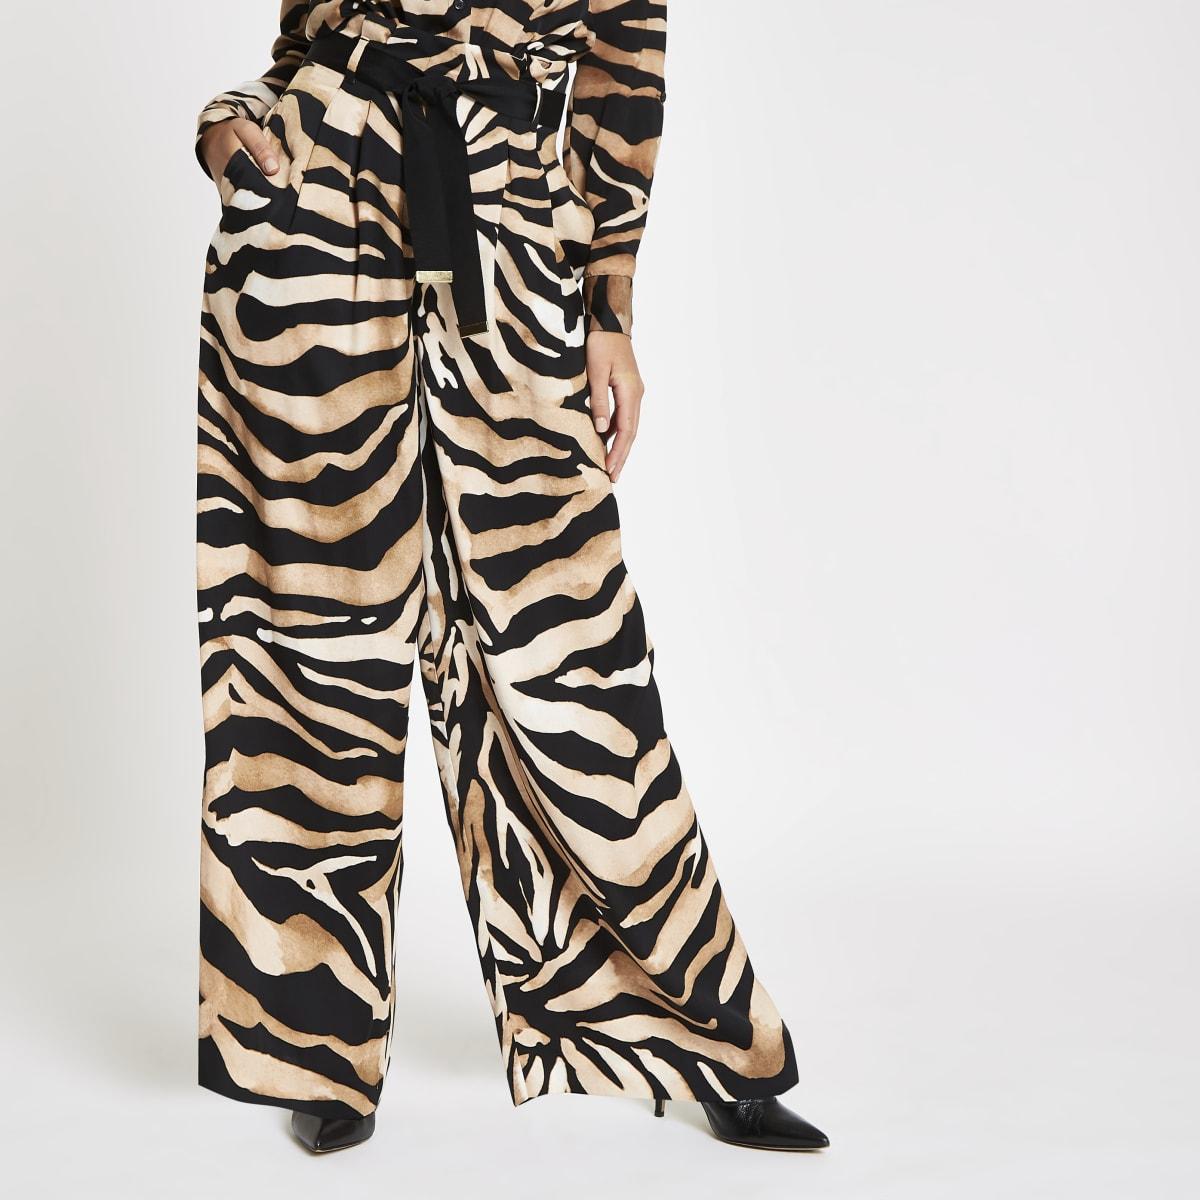 Pantalon large imprimé tigre marron